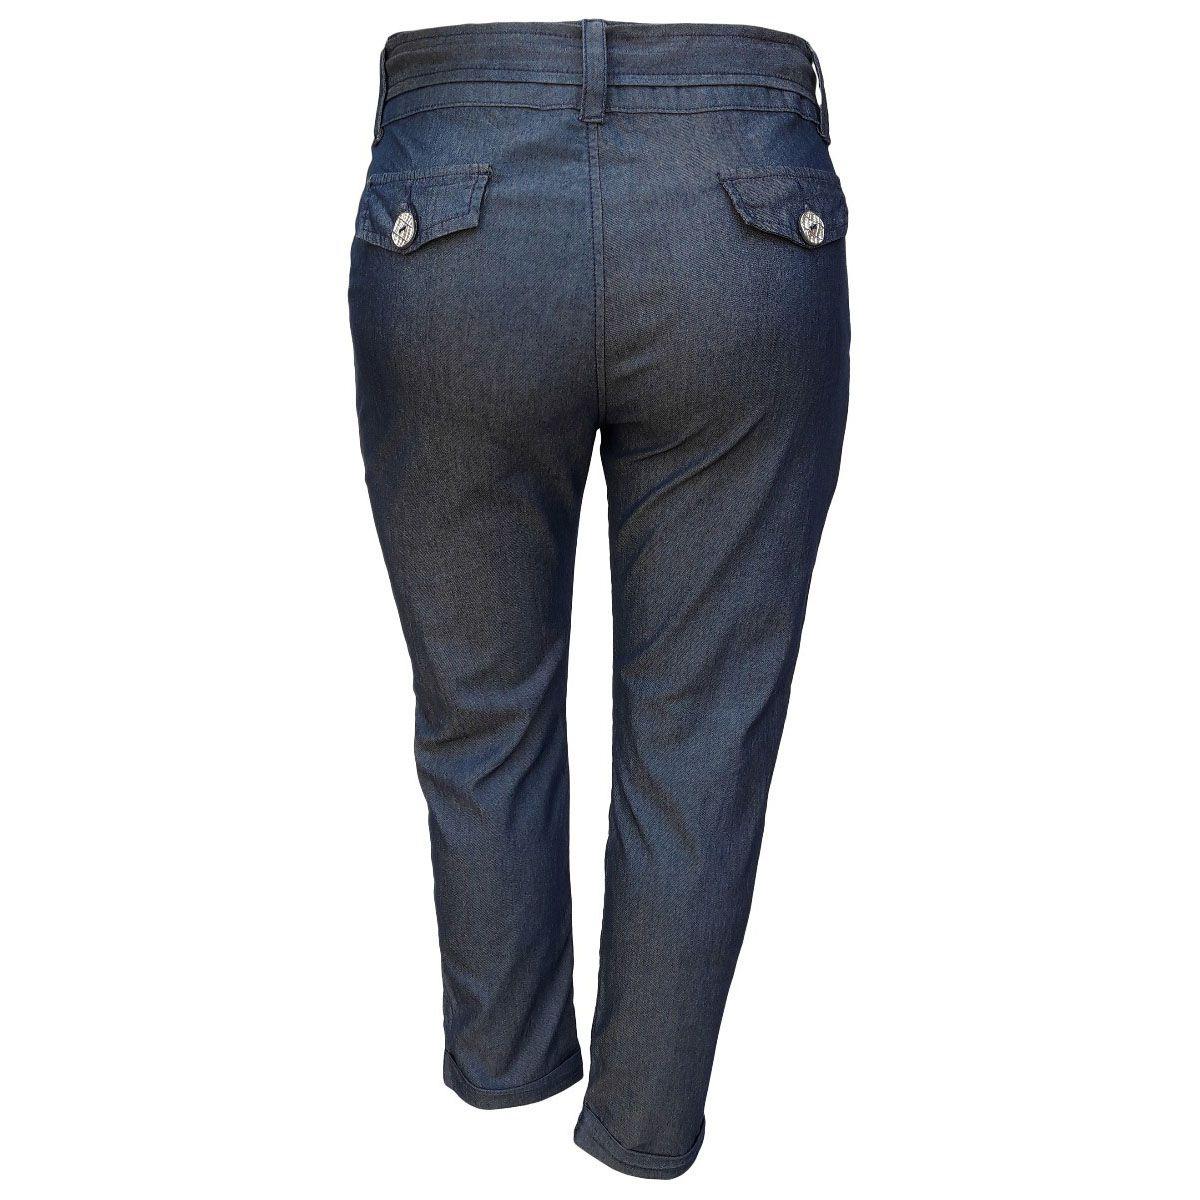 Calça Jeans Feminina Clochard Cintura Alta